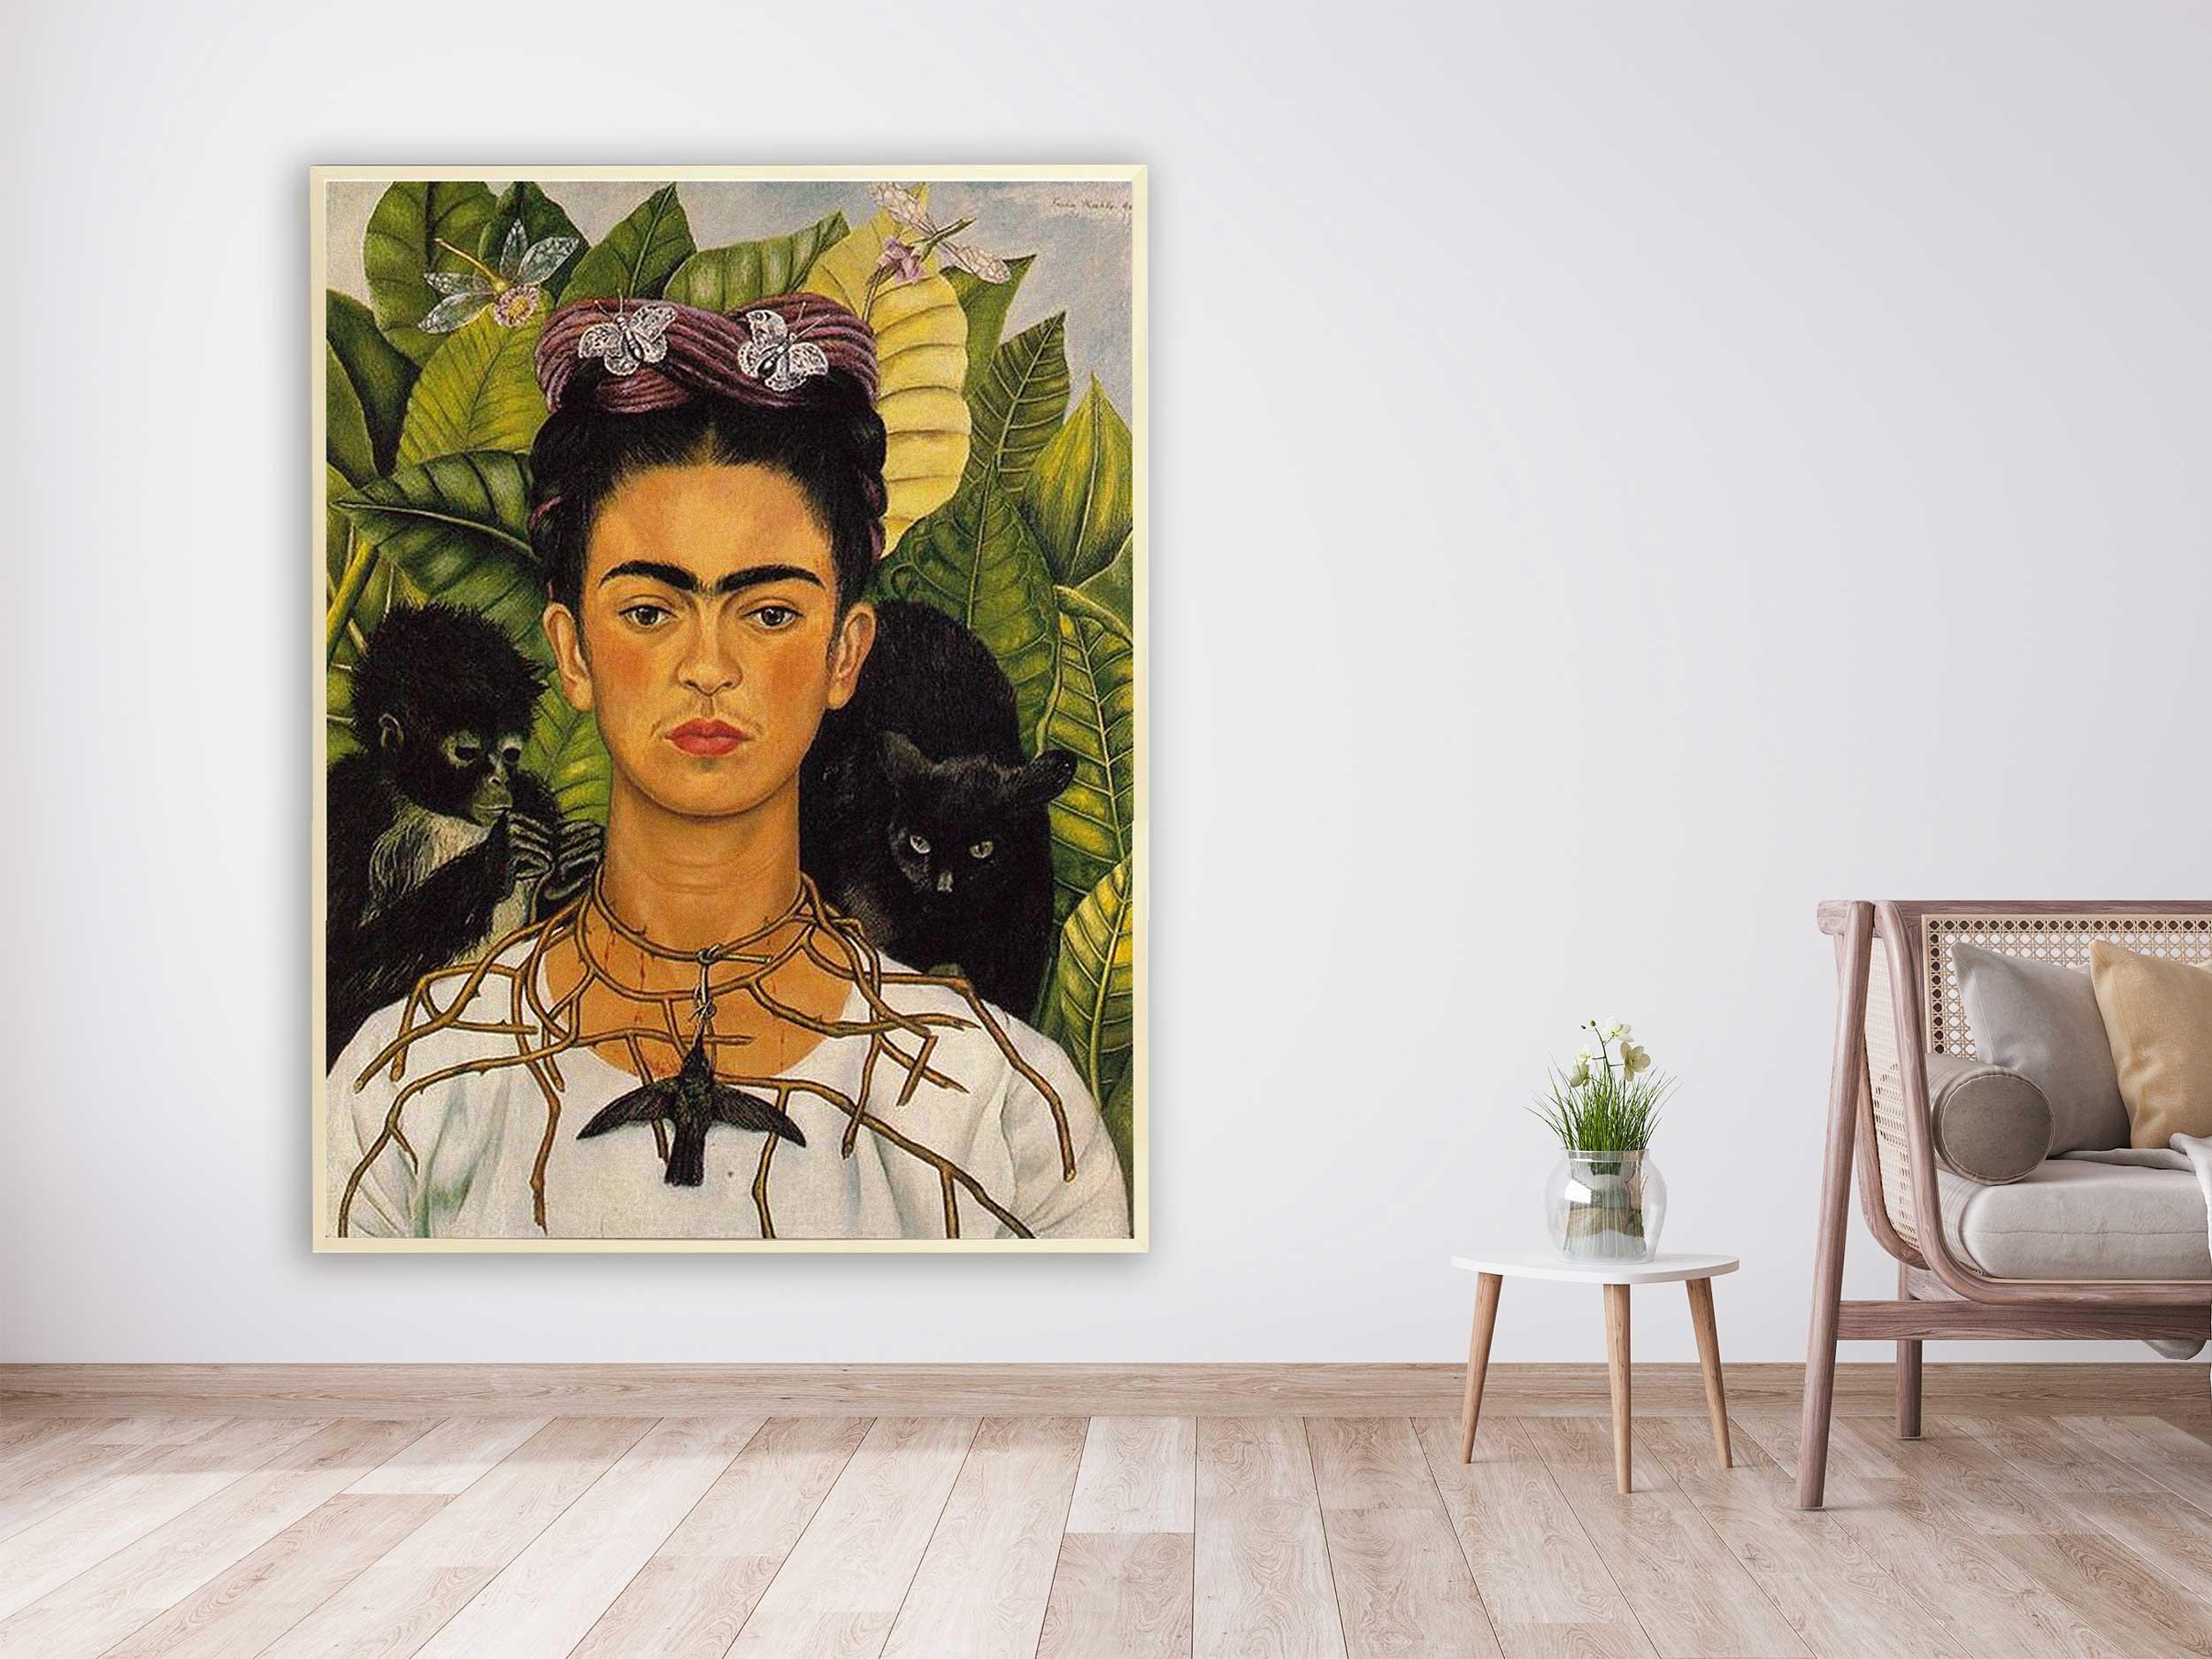 Frida Kahlo -  Self-portrait with Thorn Necklace and Hummingbird, 1940, Bilderrahmen ahorn